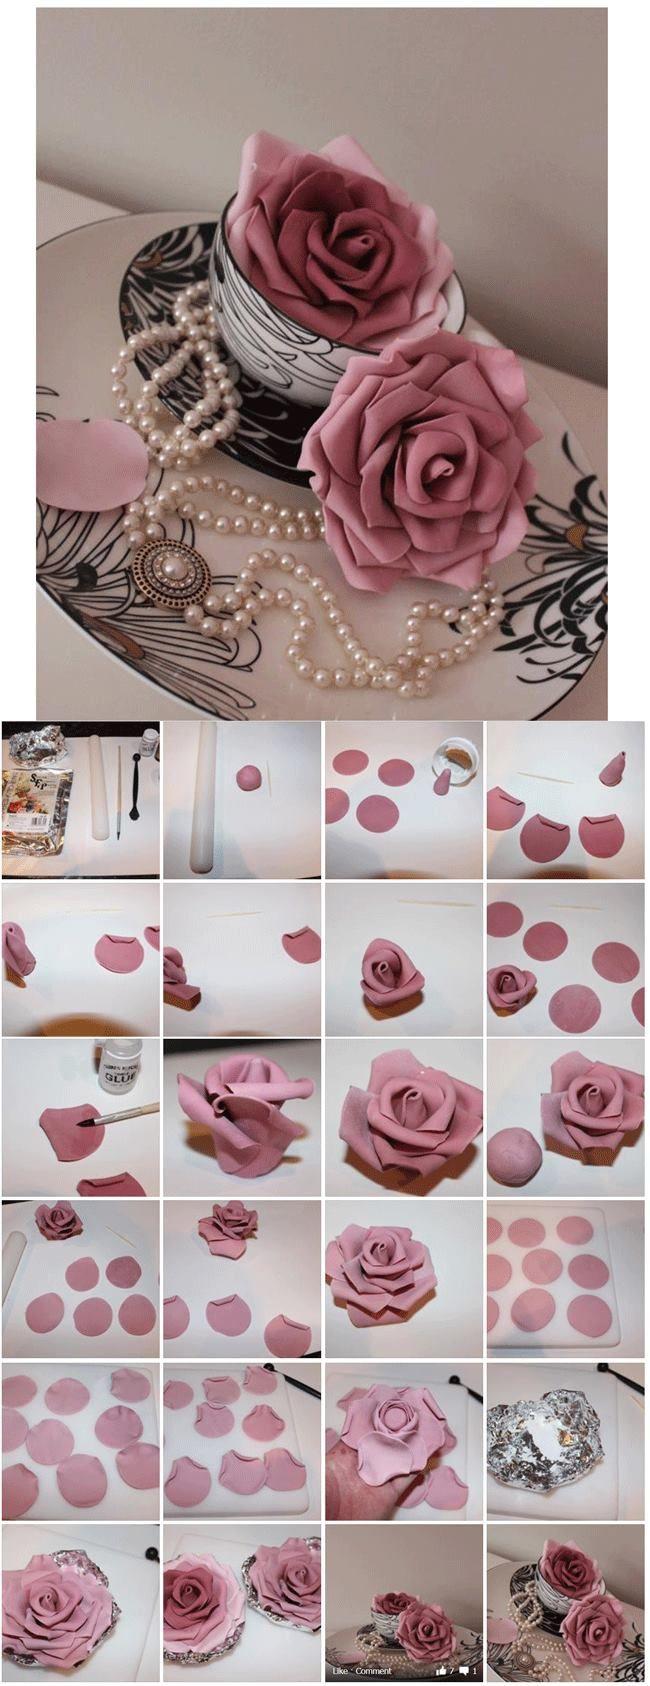 Pin by Ros sharp on Wedding cake | Fondant cakes, Fondant